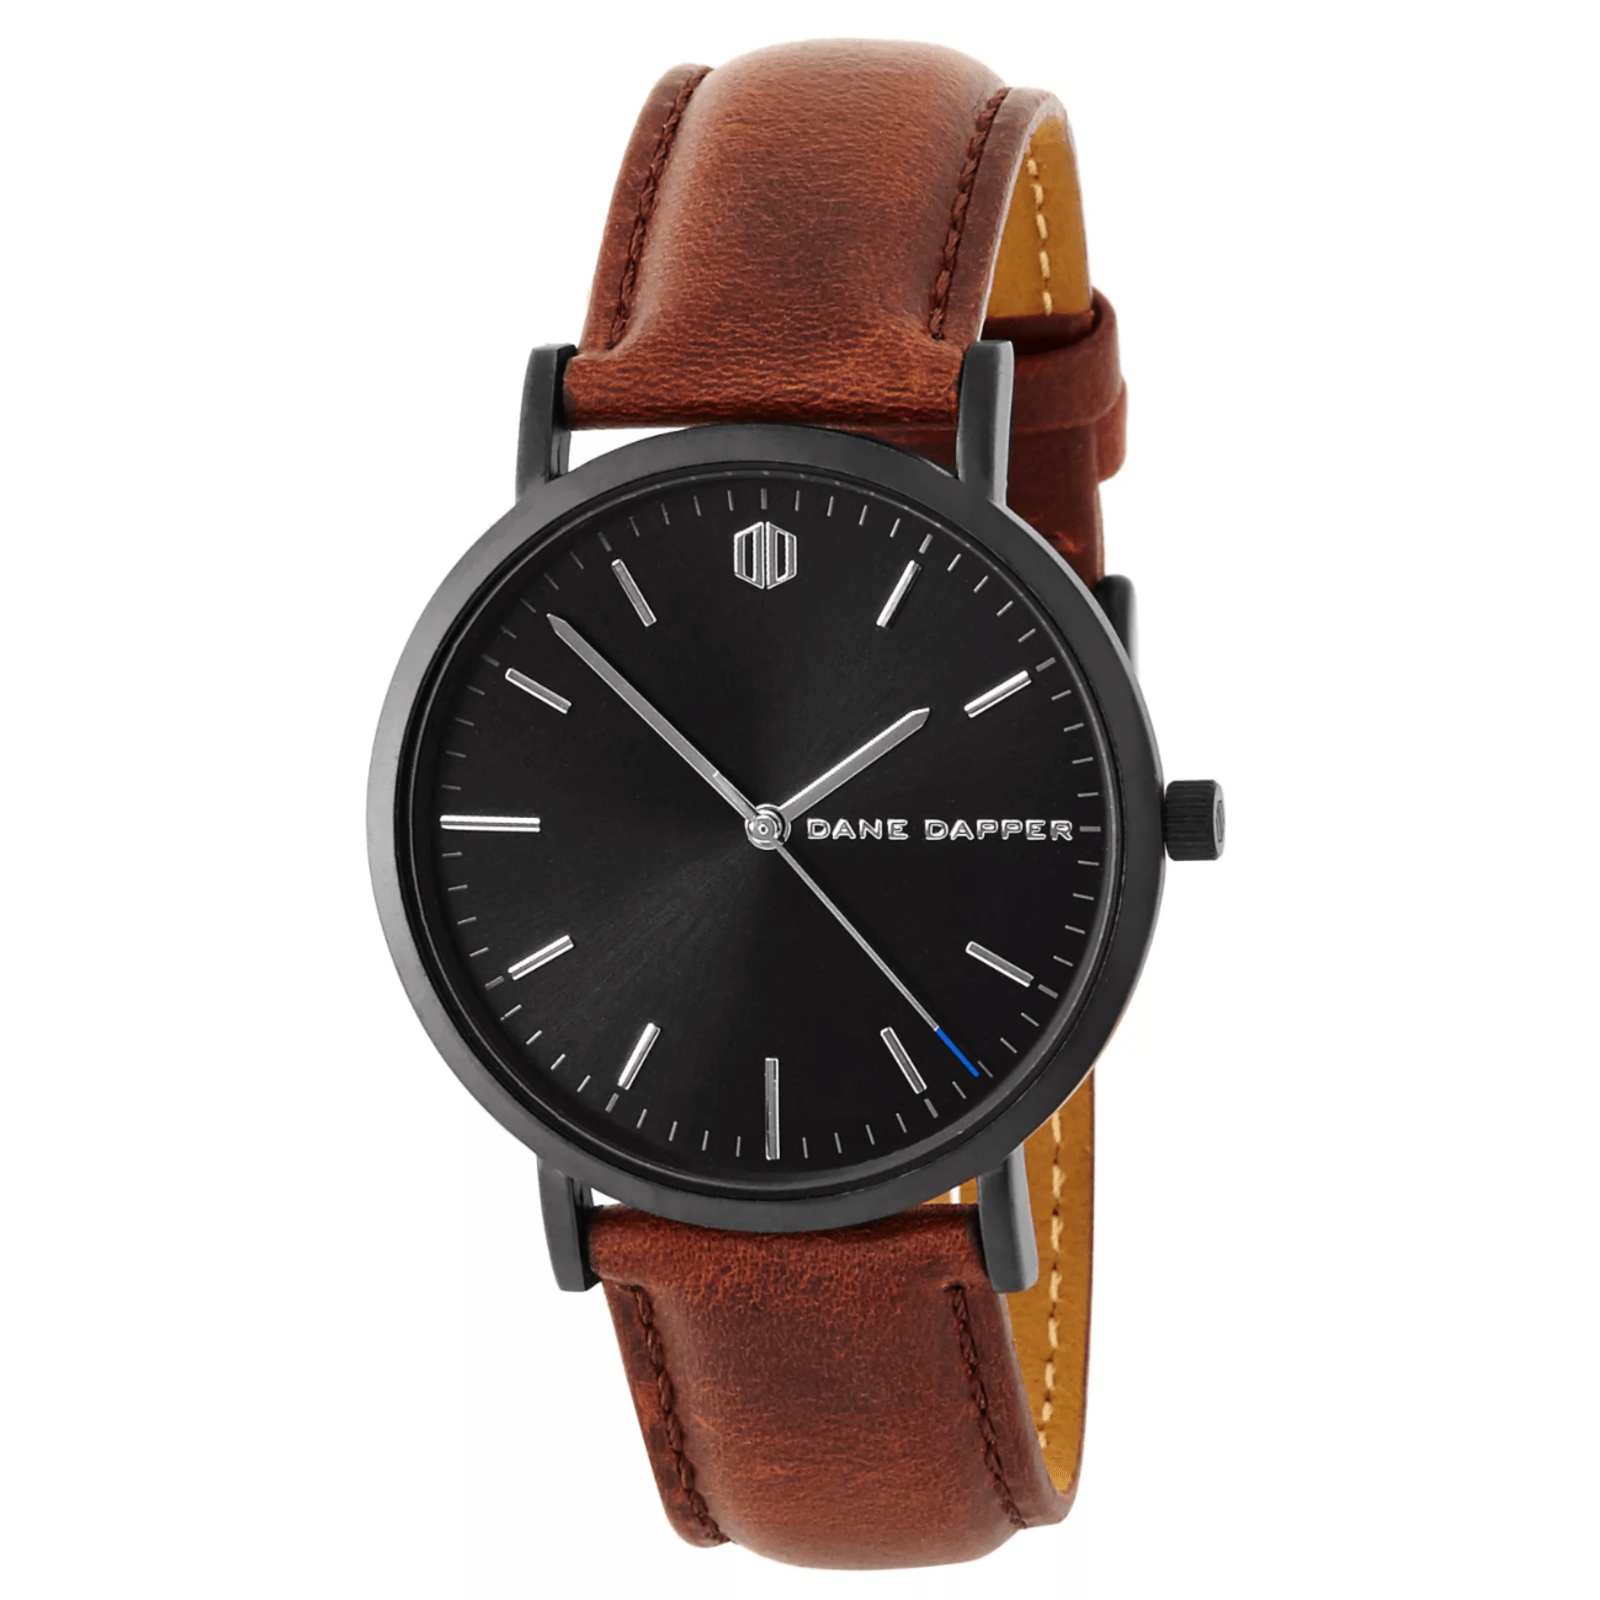 6 Holz Aus Luxus Rotem Armbanduhramp; Uhrenbox Impeccable Uhren Lucas Armband F1lKcJT3